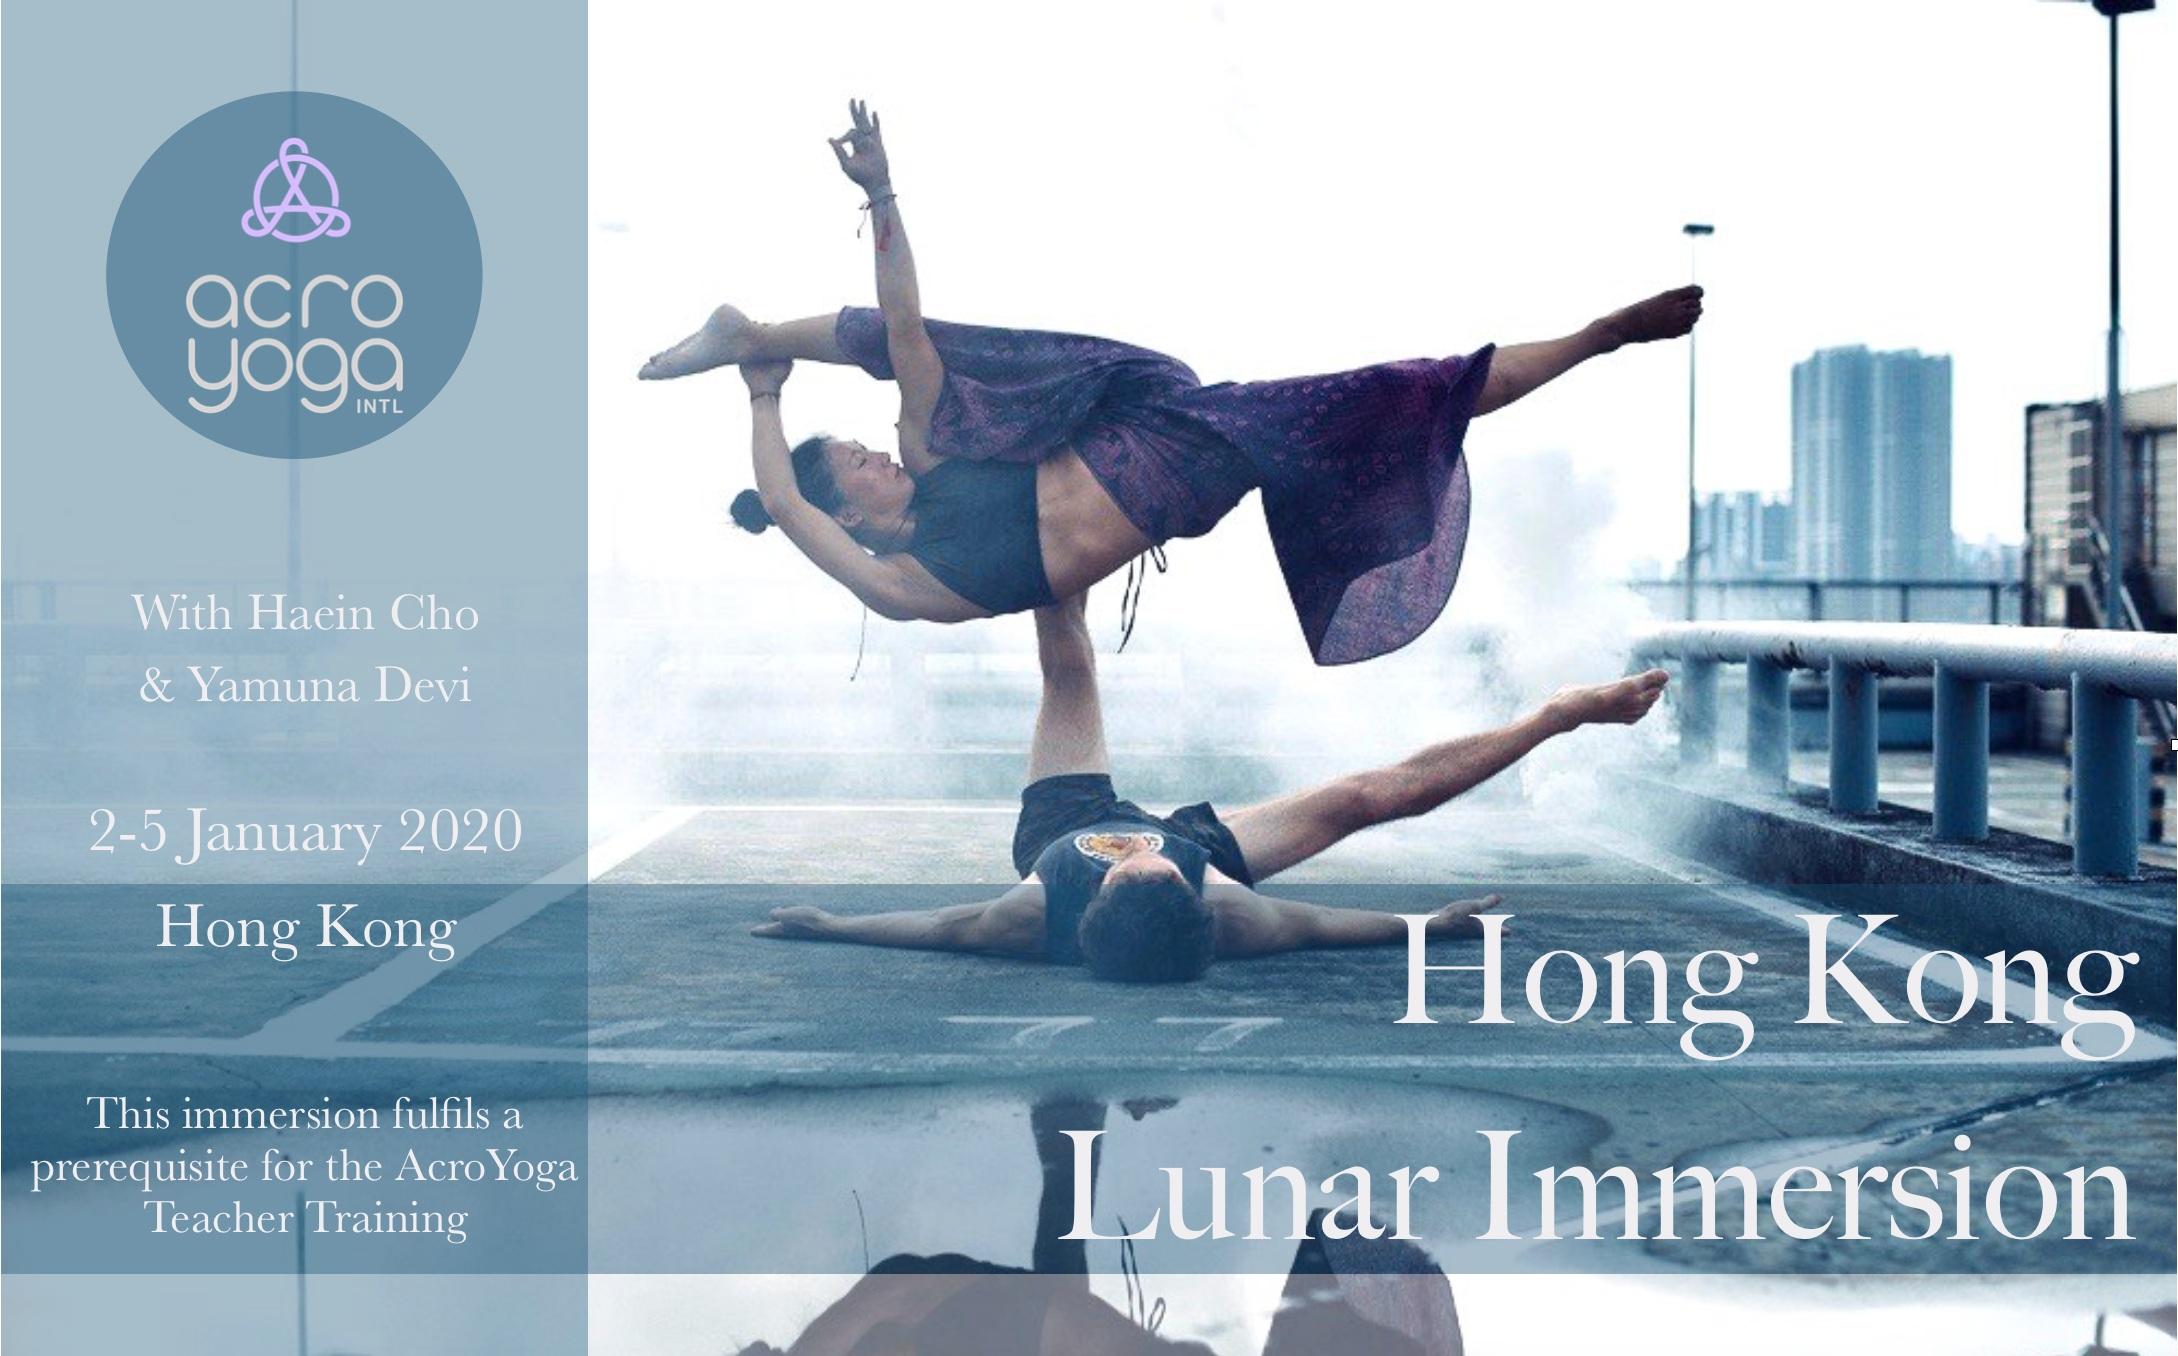 HongKong Acroyoga Lunar Immersion 2-5th Jan